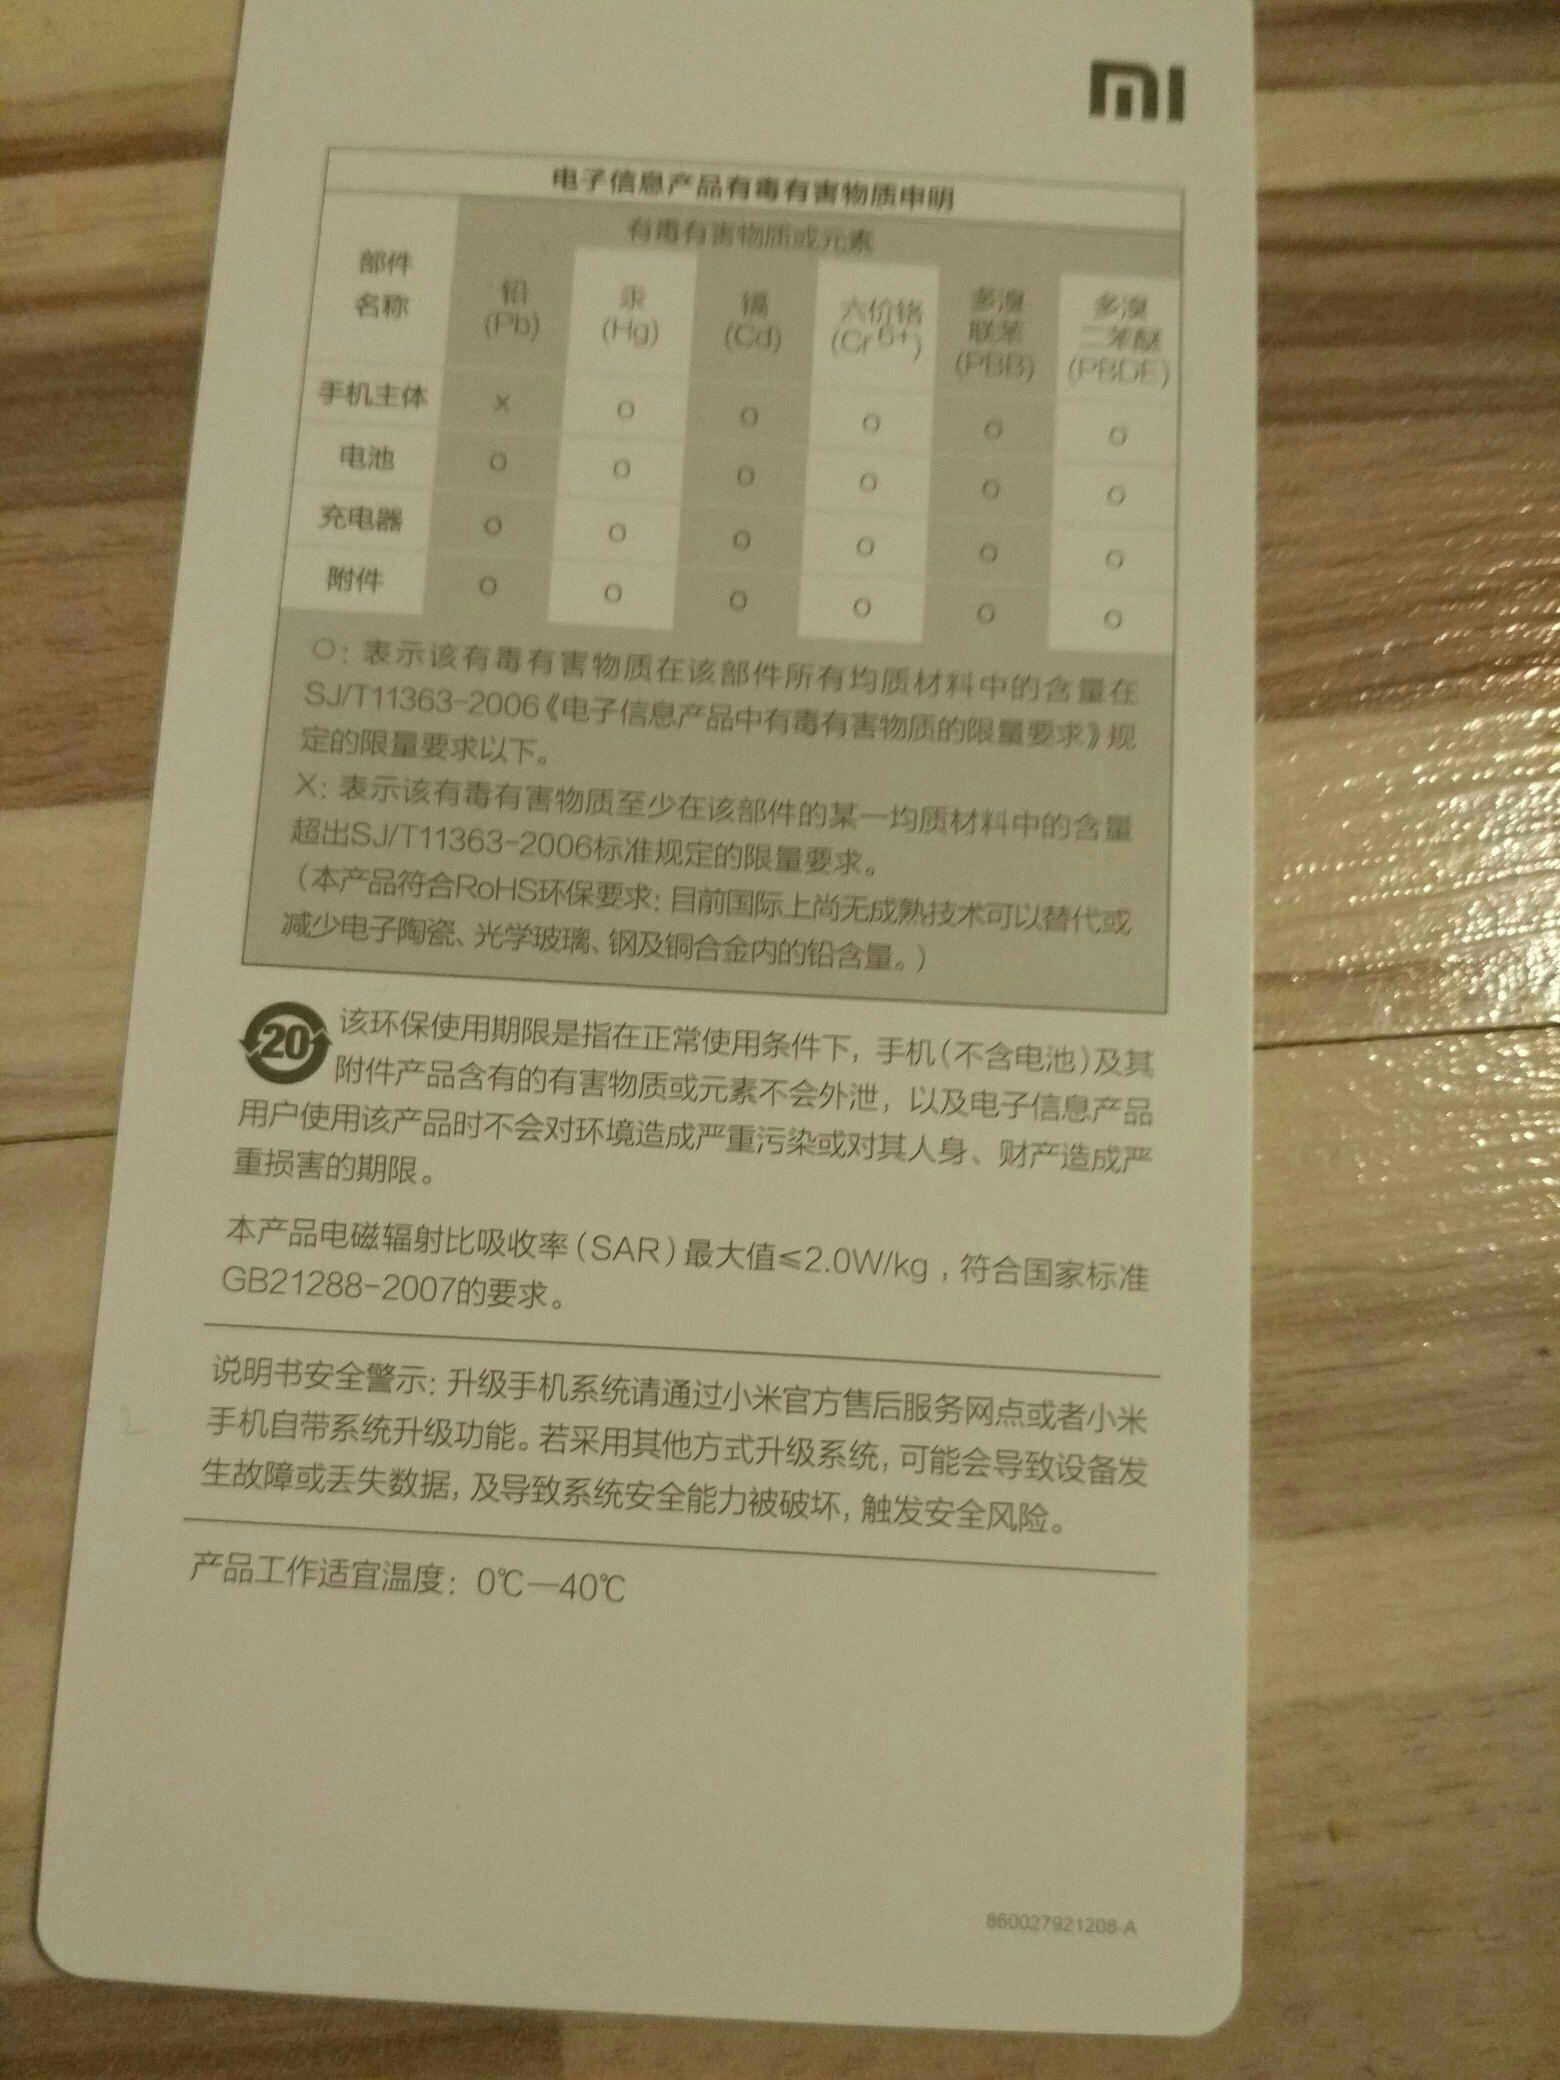 dcd50d9366d1cf02fff27d4c29152cc8.jpg